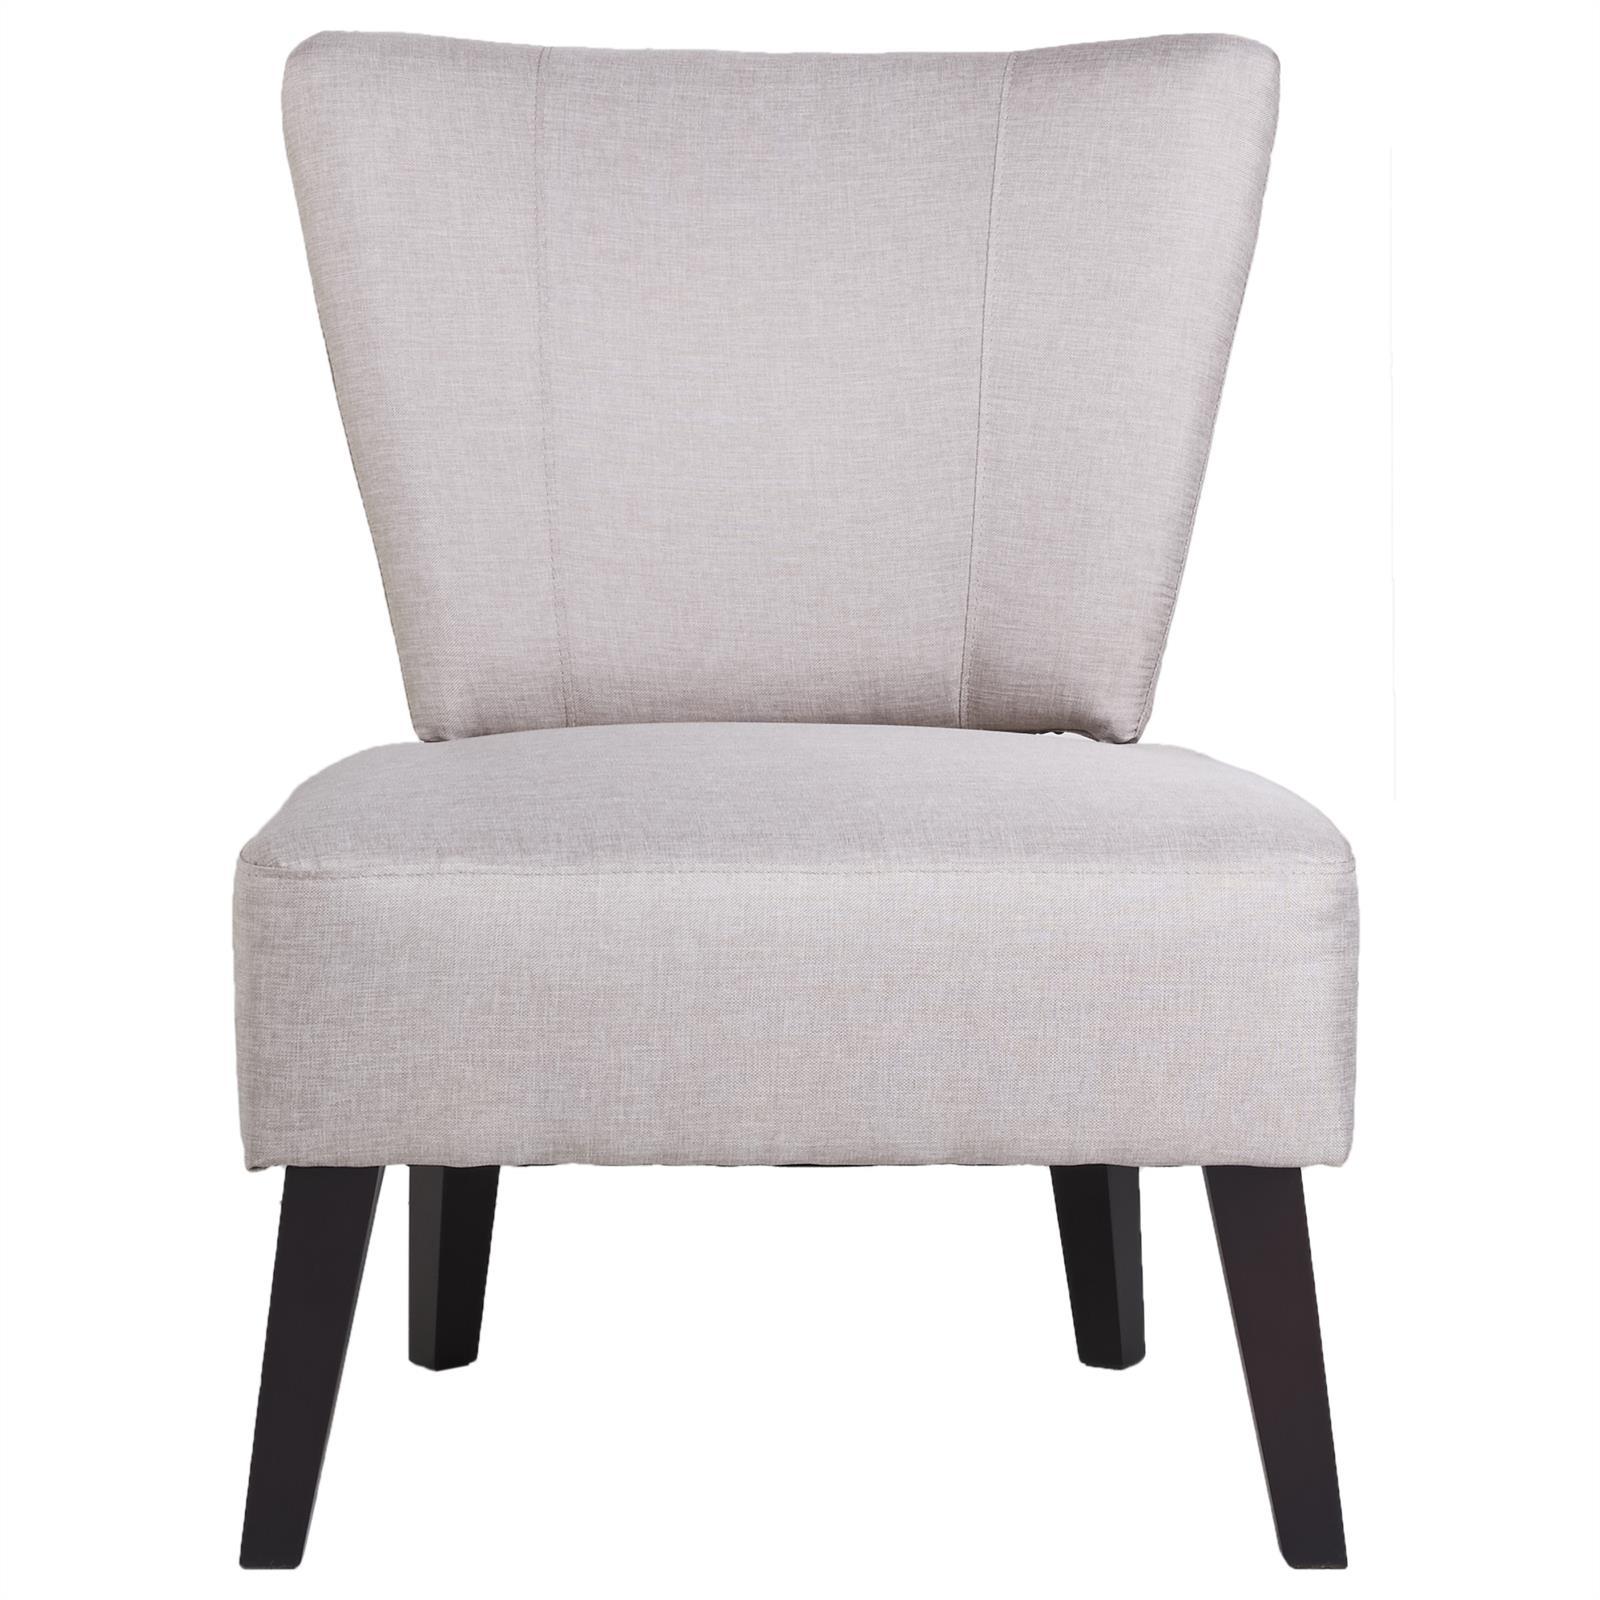 lounge sessel cairo stoffbezug hellgrau mobilia24. Black Bedroom Furniture Sets. Home Design Ideas